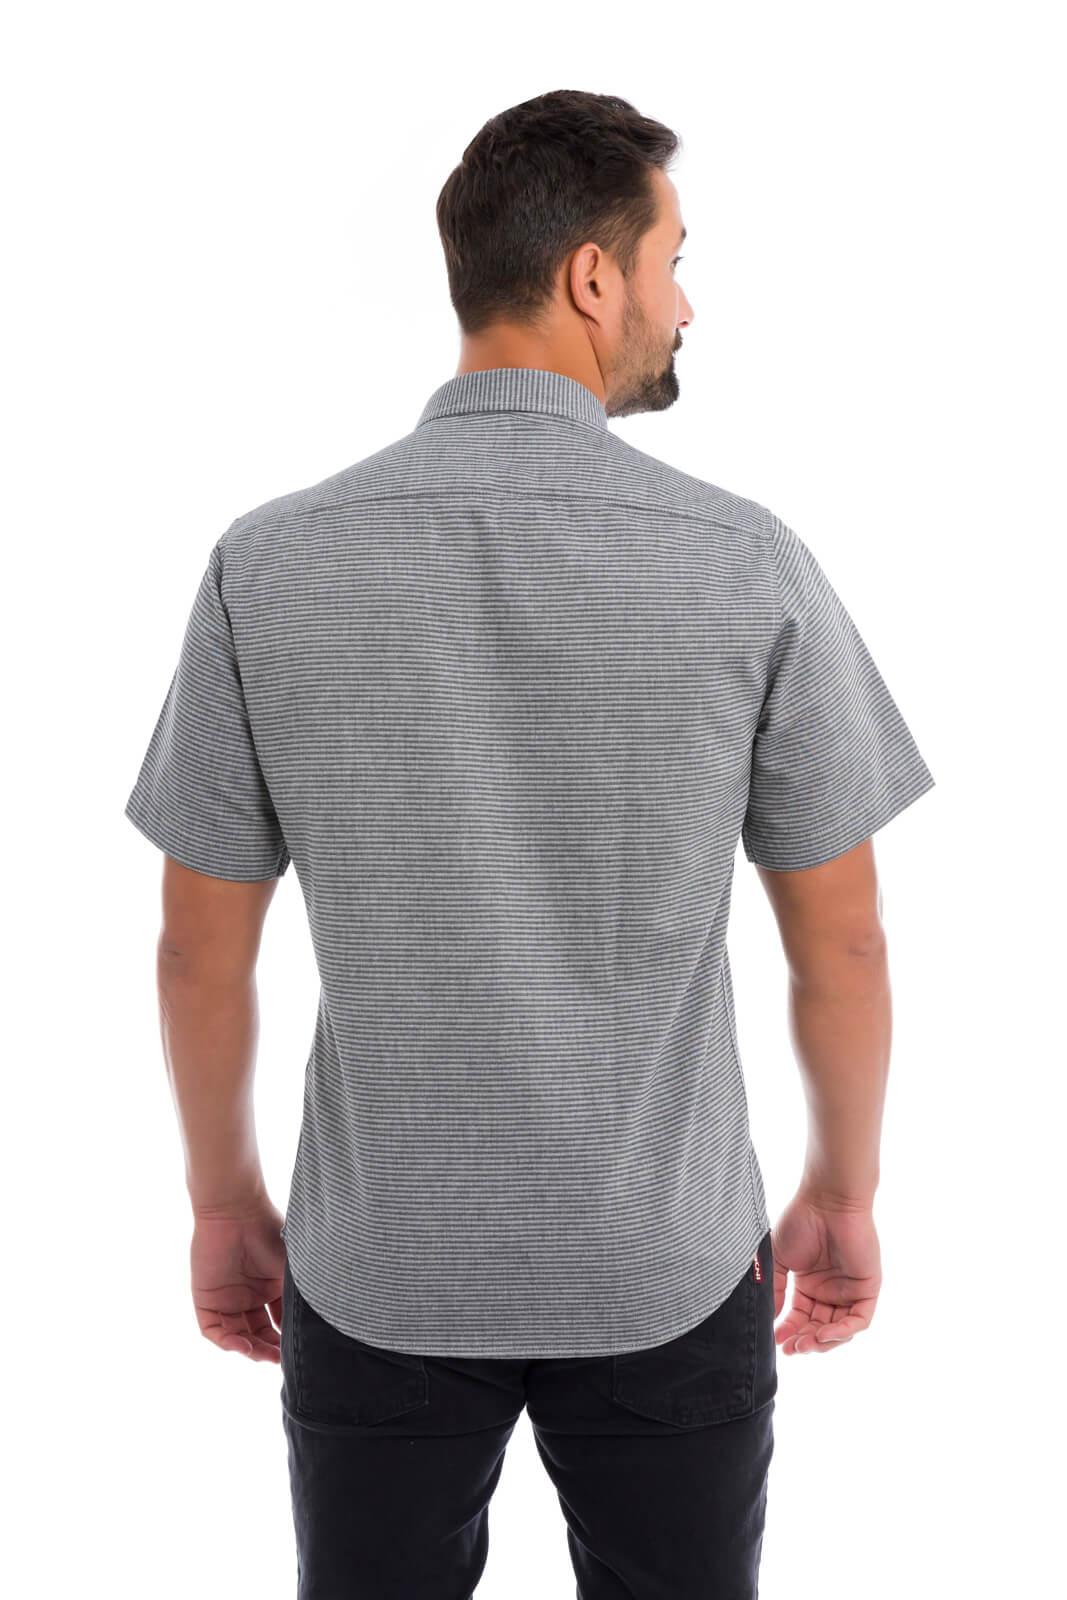 Camisa Social Masculina Slim Olimpo Chambray Listrado com Bolso Manga Curta Preta